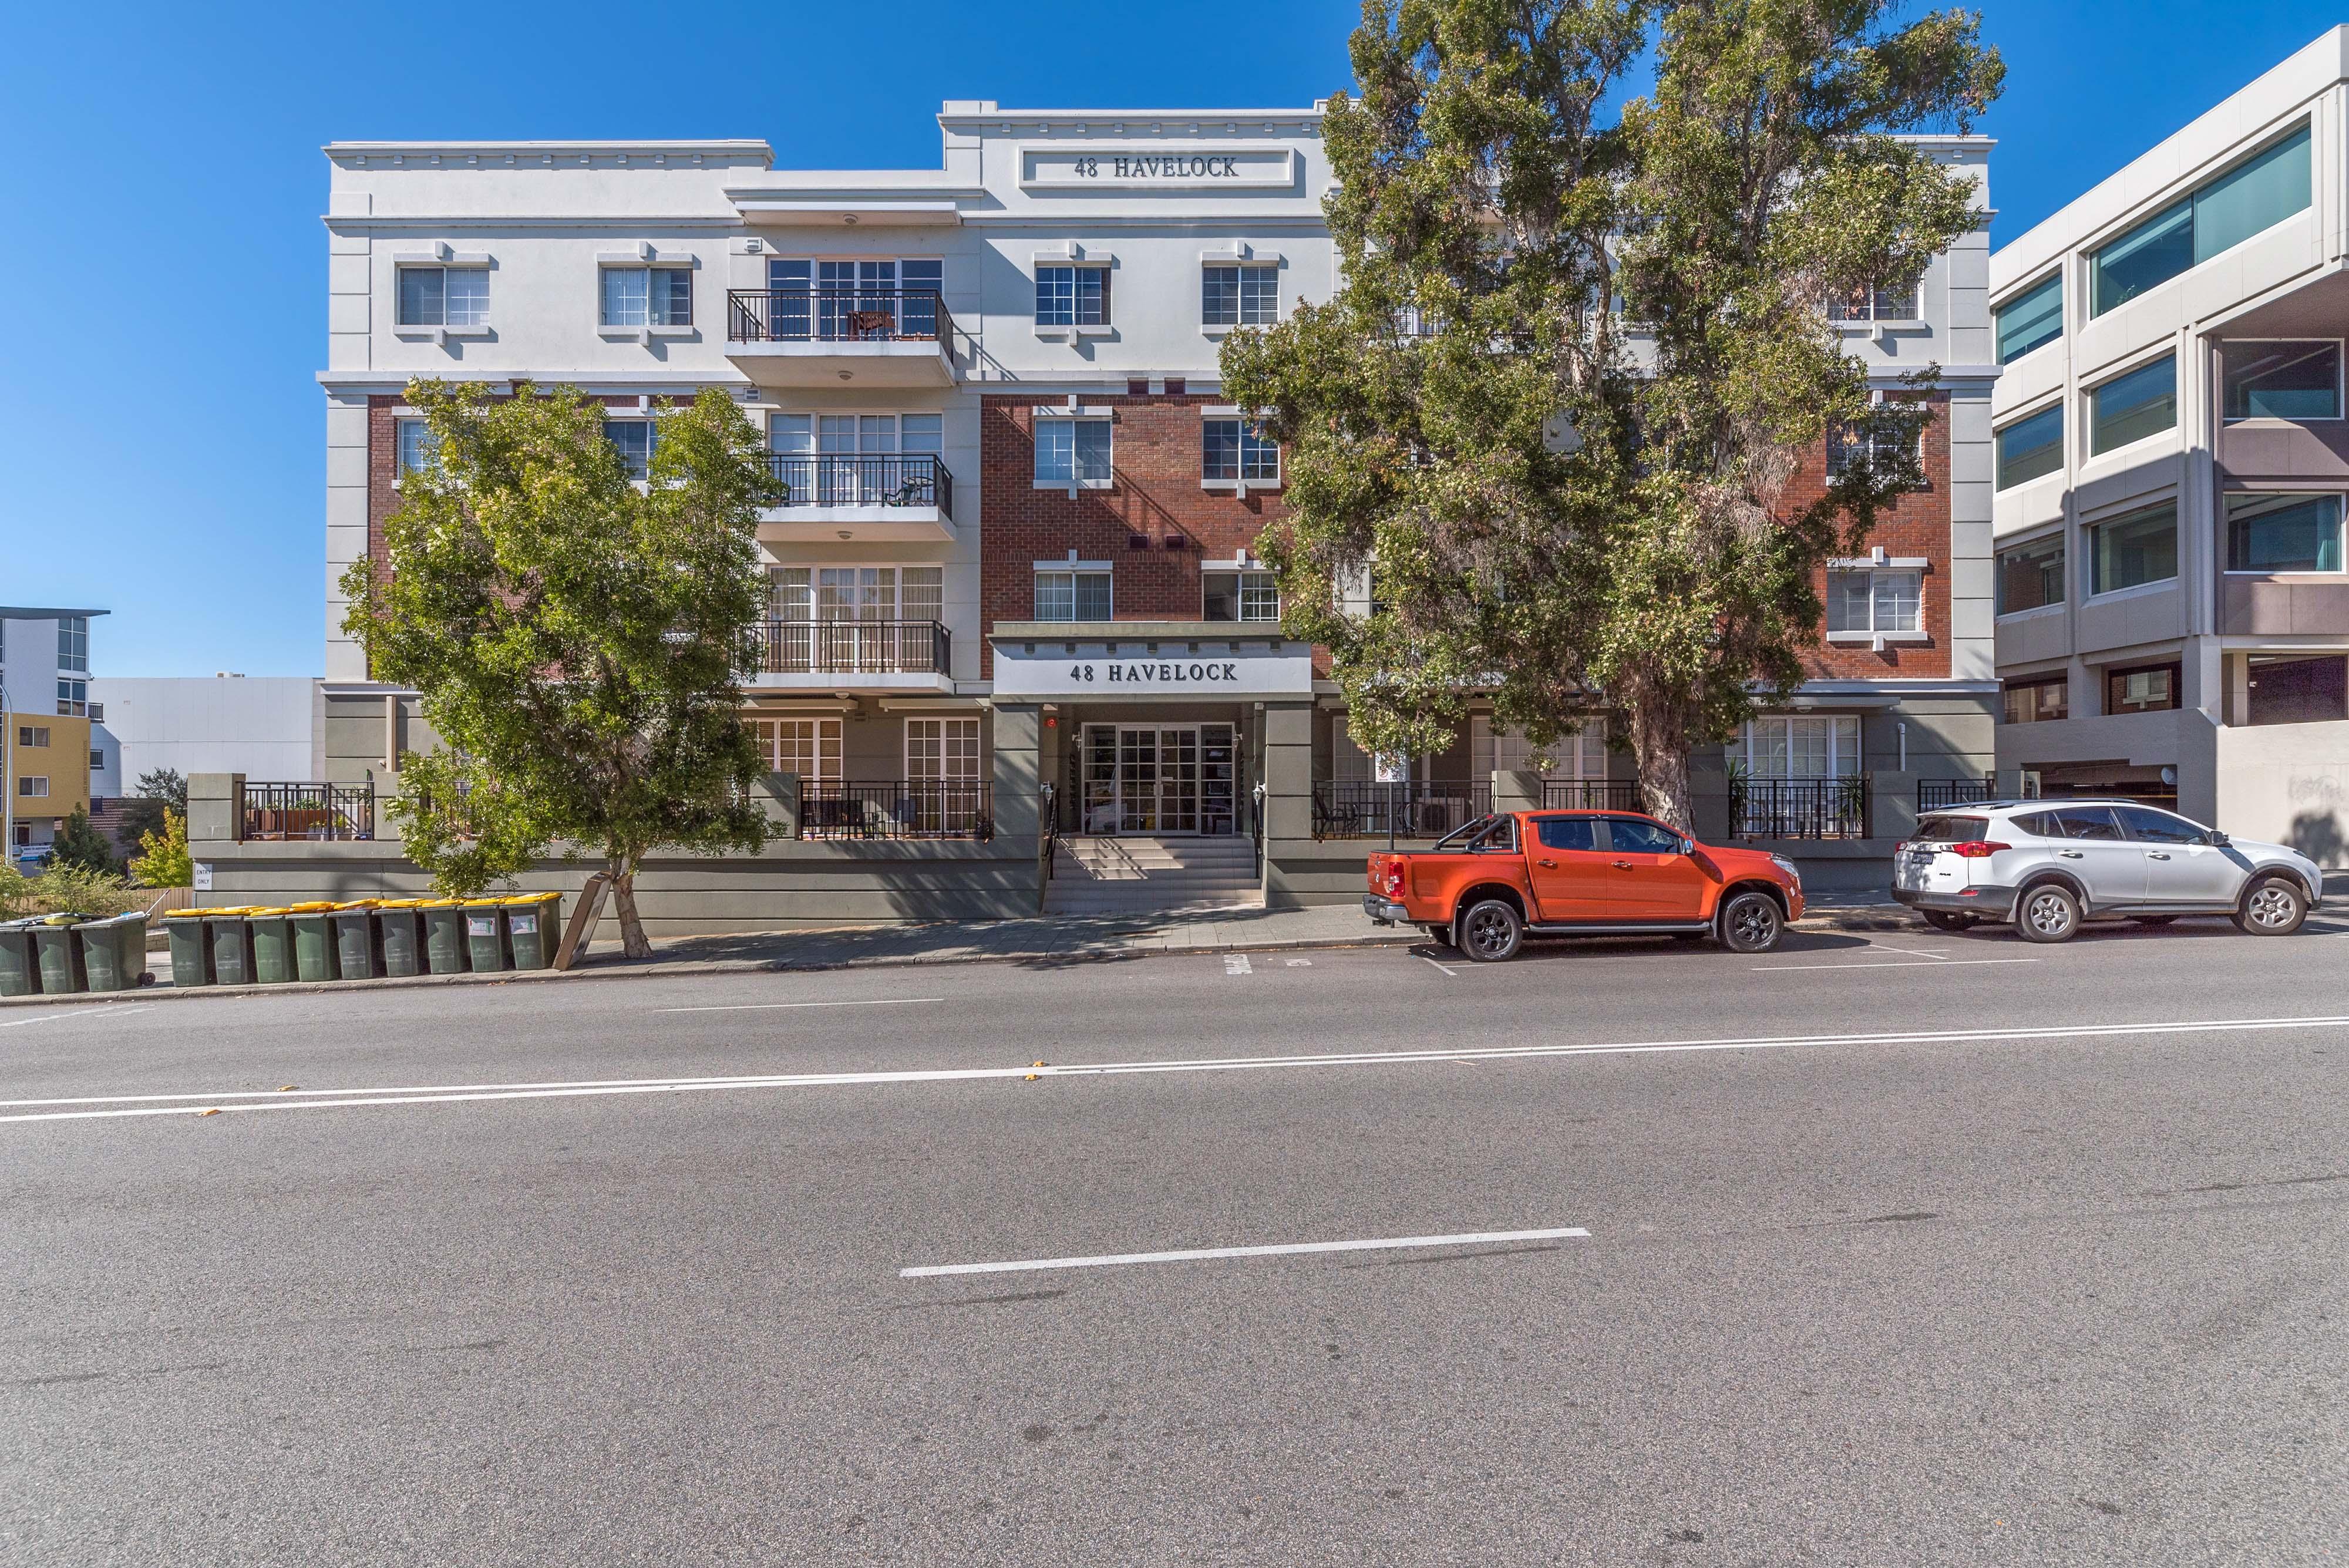 PRINT 21_48 Havelock St West Perth 03